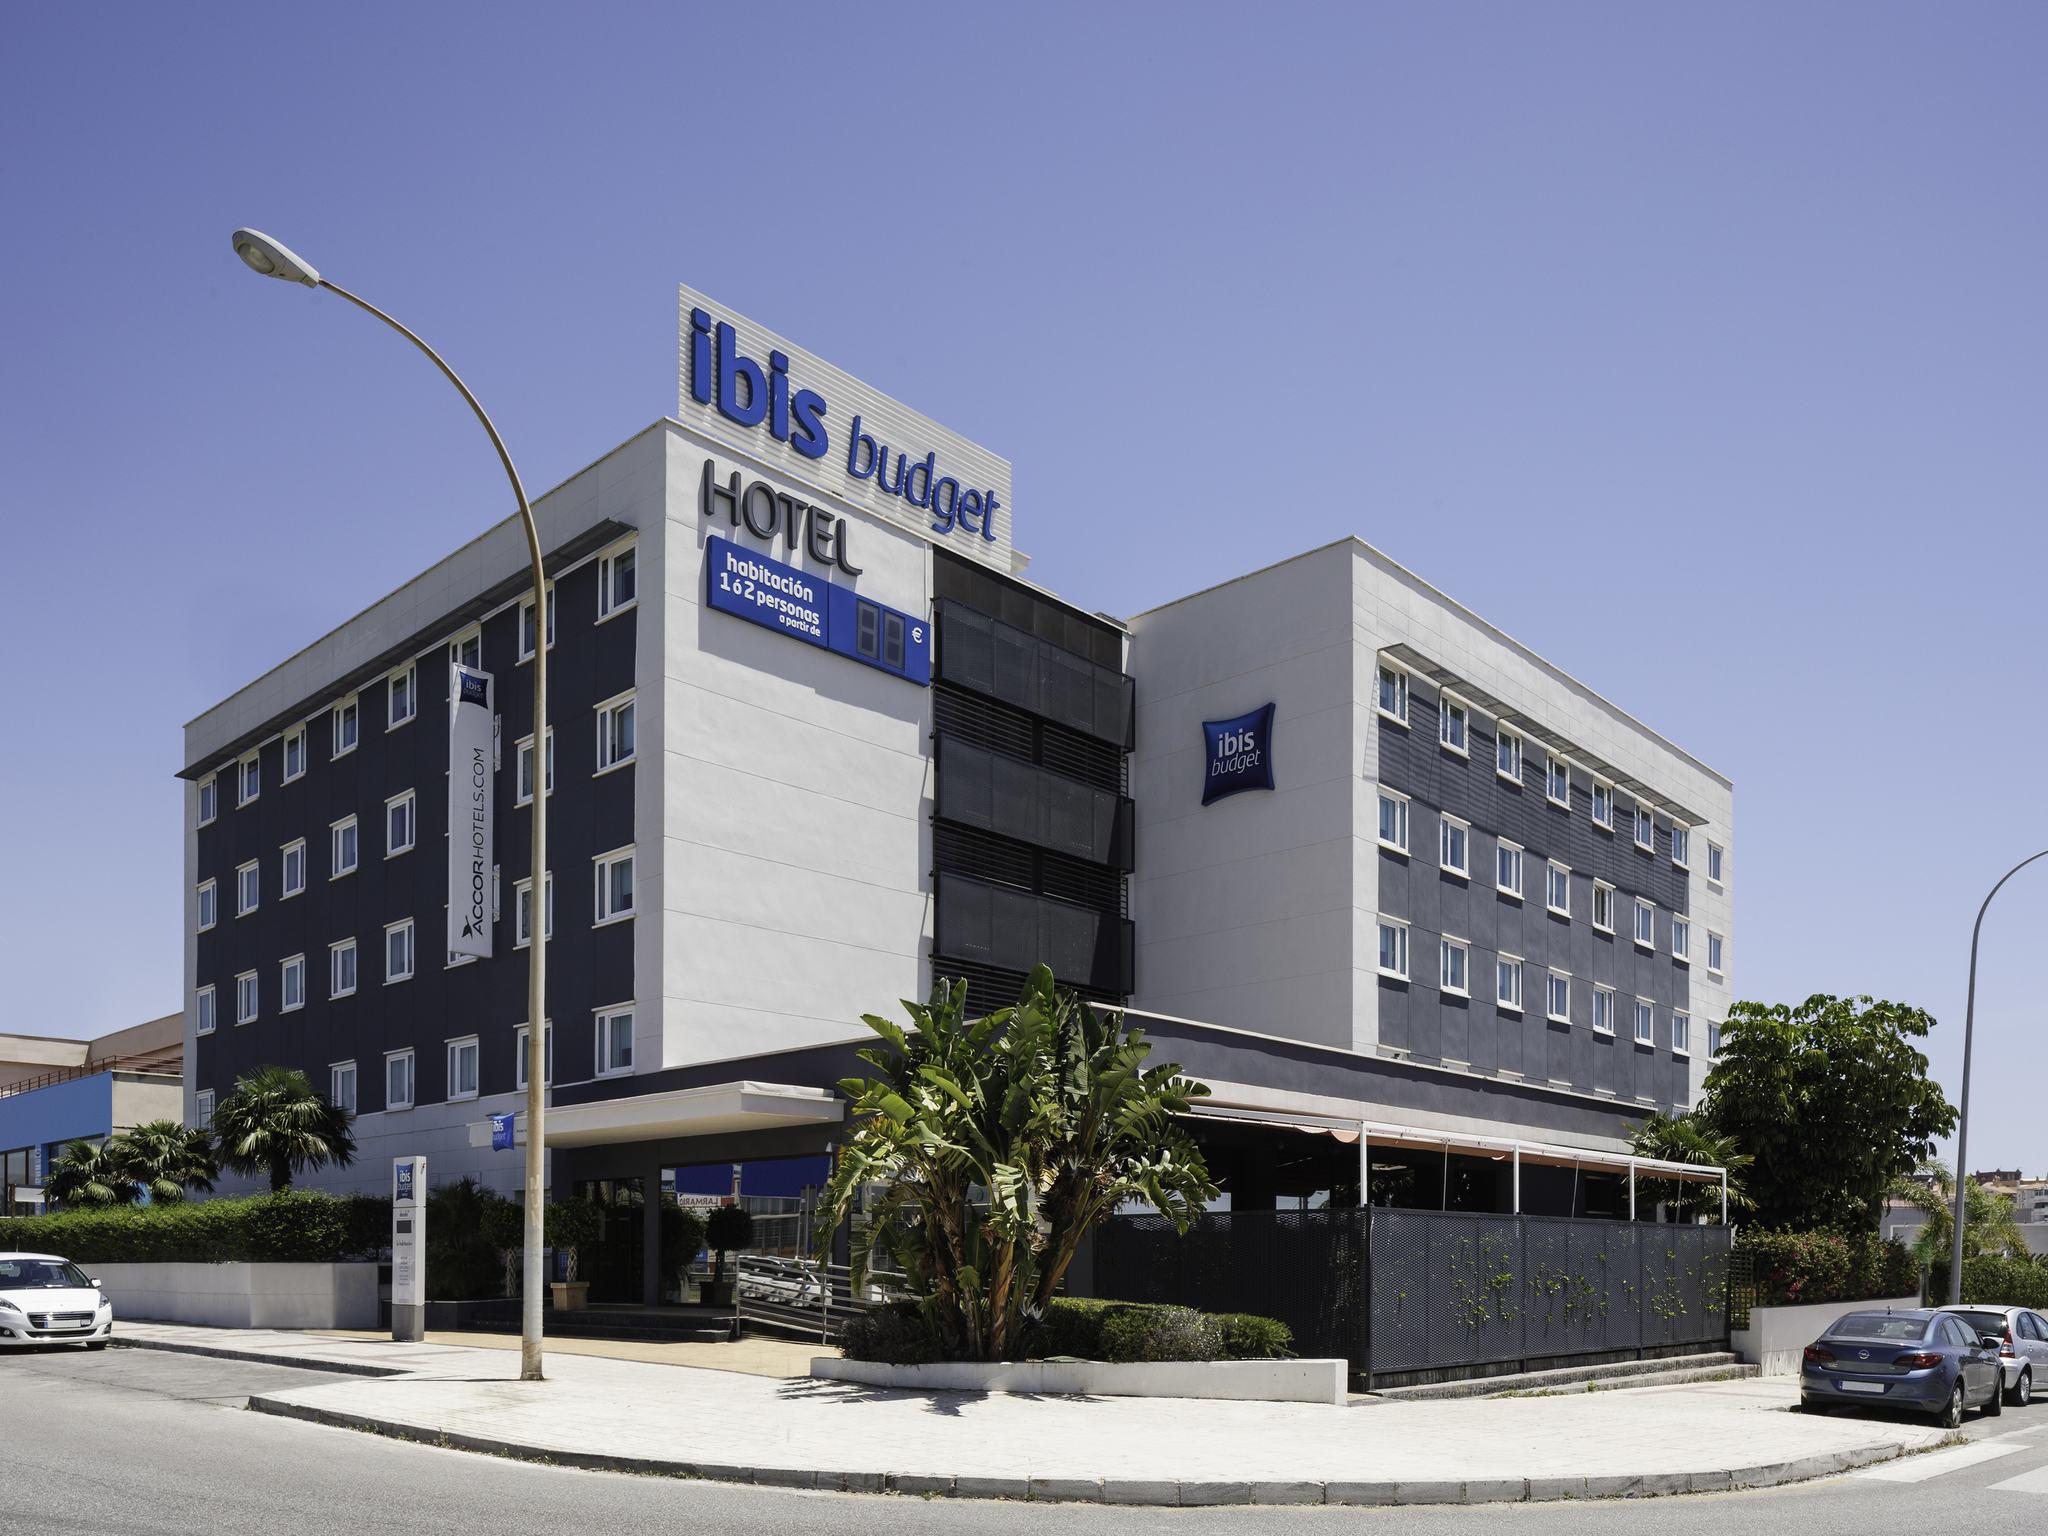 H tel malaga r servez votre ibis conomique pr s de l for Hotels malaga